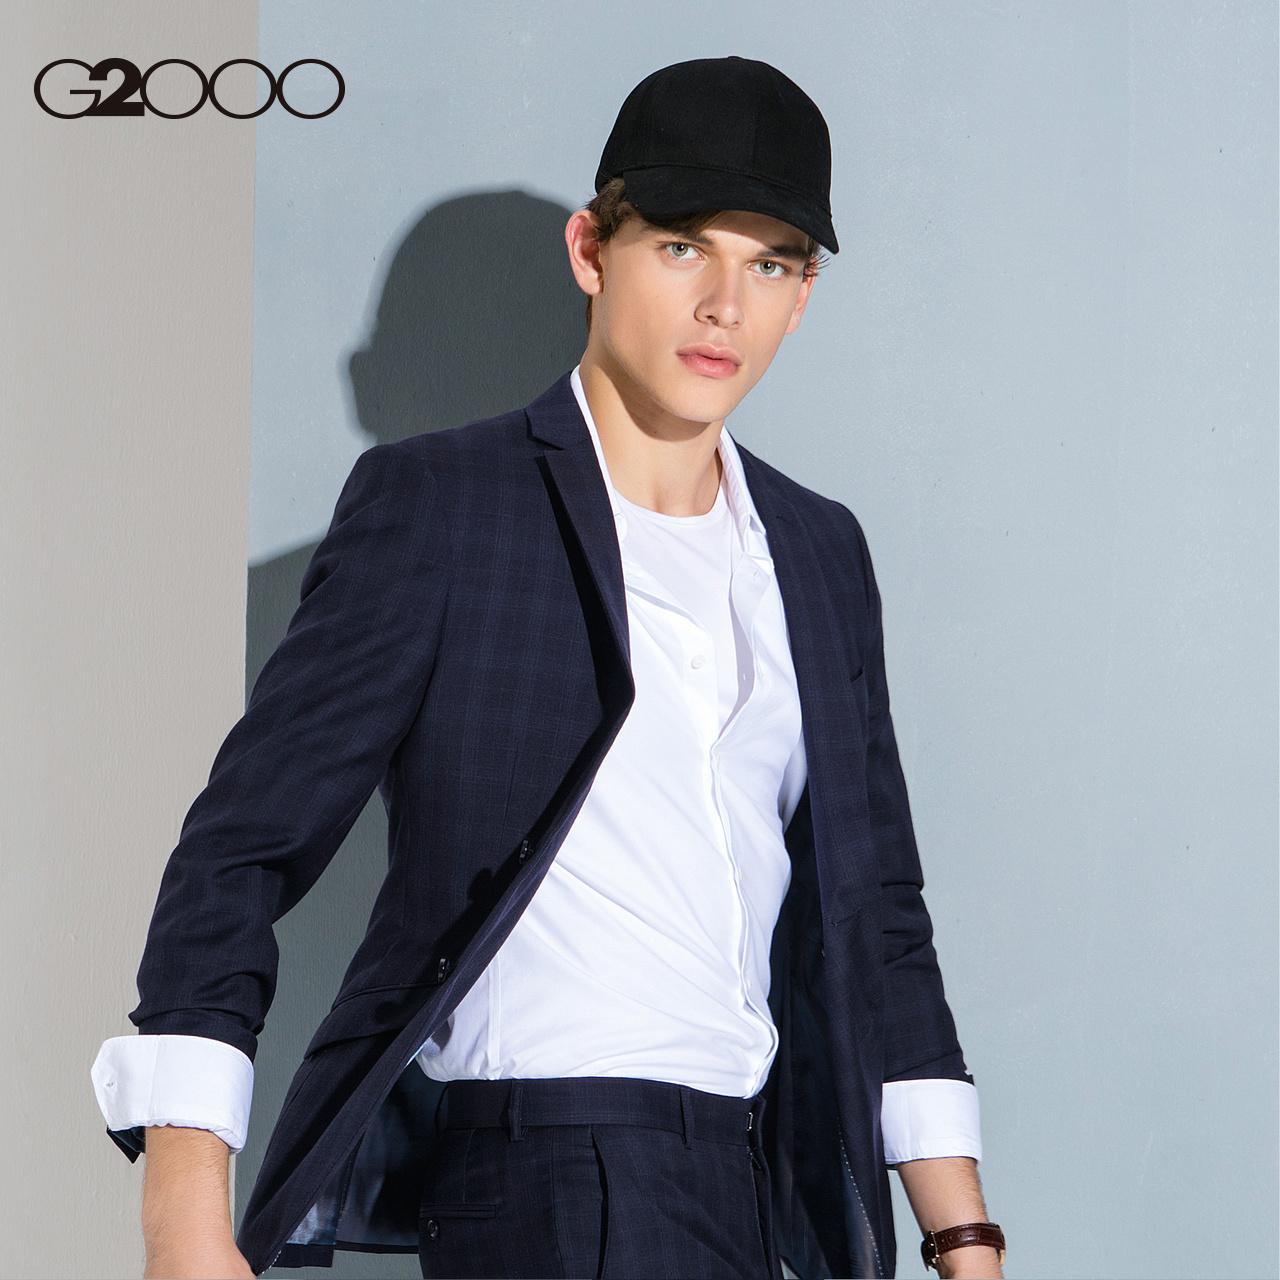 G2000男装纯羊毛舒适冰感格子西装 2018新款商务修身西服外套